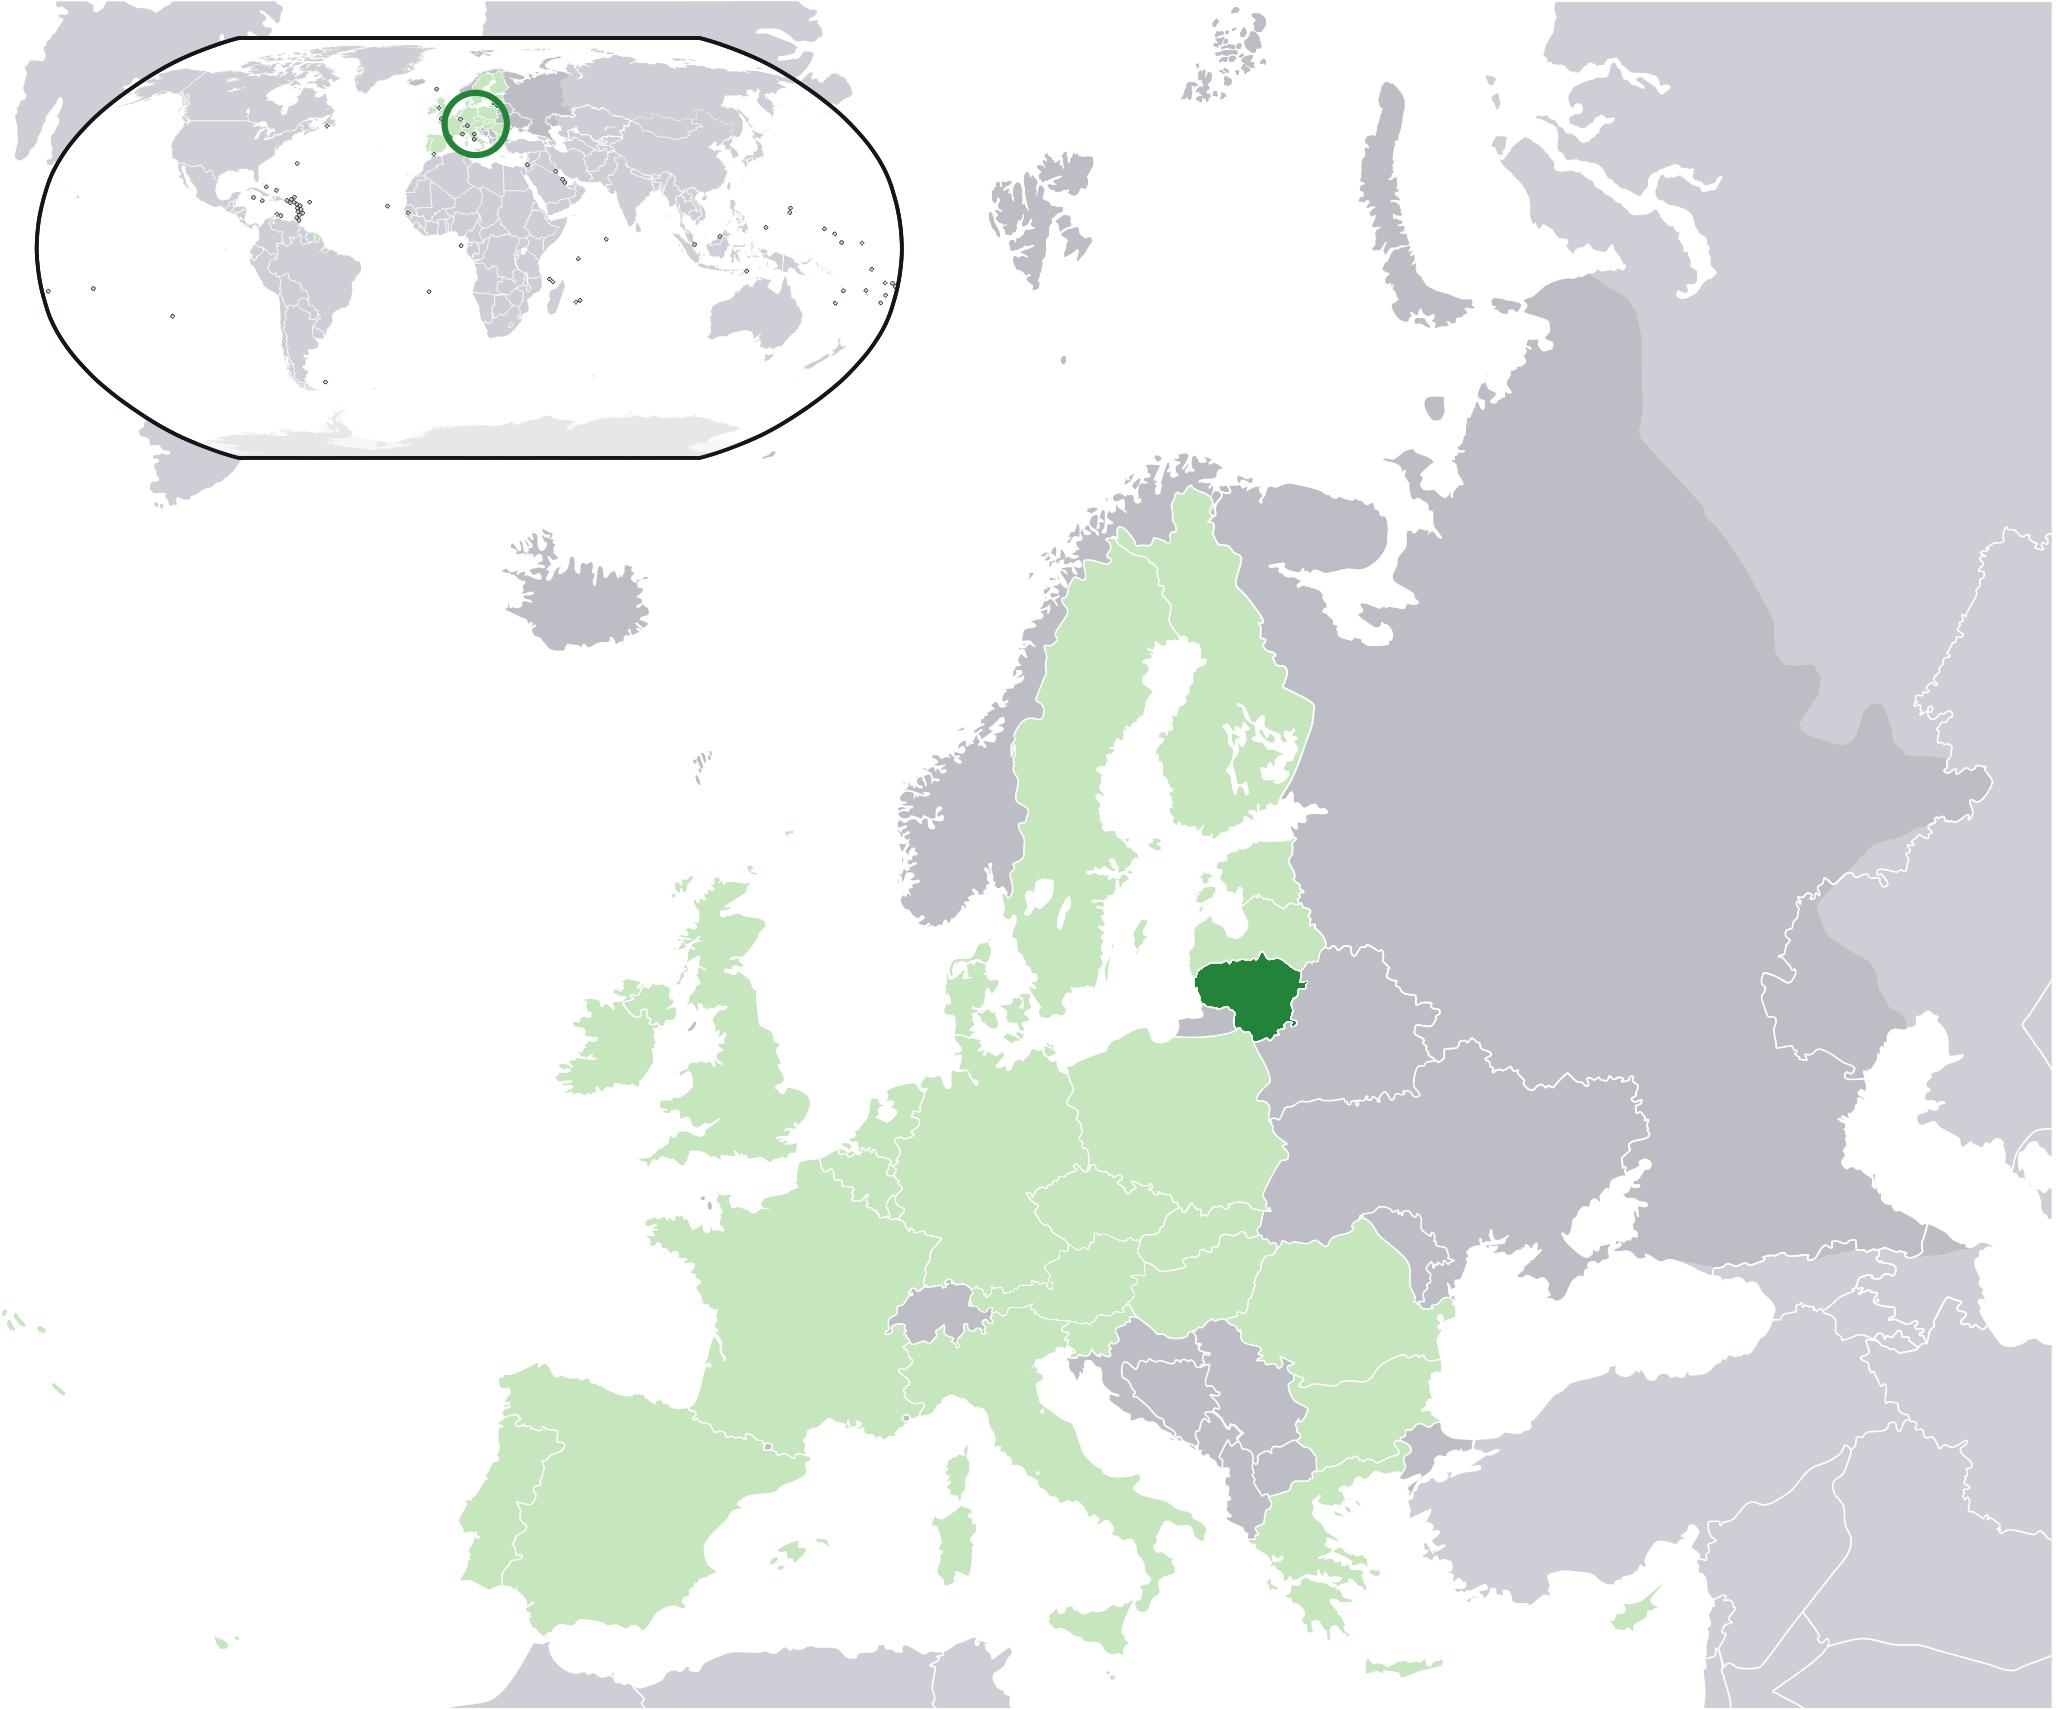 Lithuania On Europe Map.File Location Lithuania Eu Europe Png Wikimedia Commons